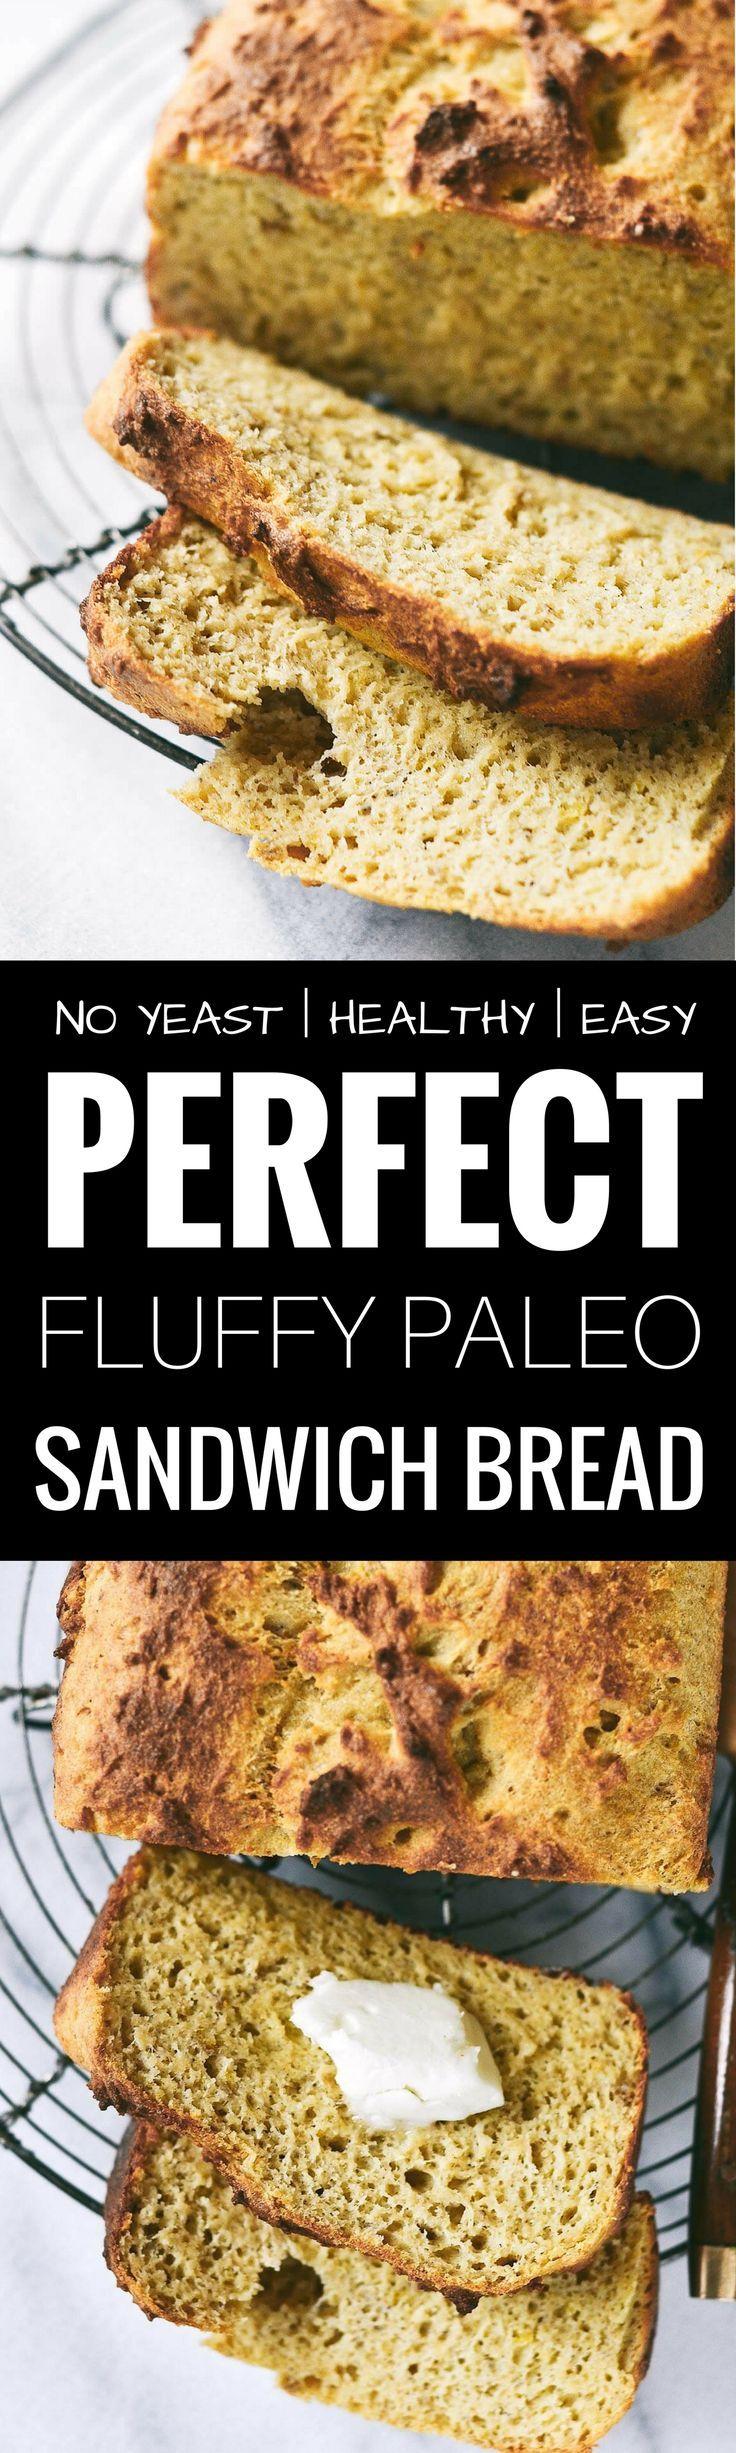 Perfect paleo sandwich bread. Toastable. Sandwichable. Low carb. Grain free. Yeast free. Light. Fluffy. Awesome crust. Best gluten free sandwich bread!